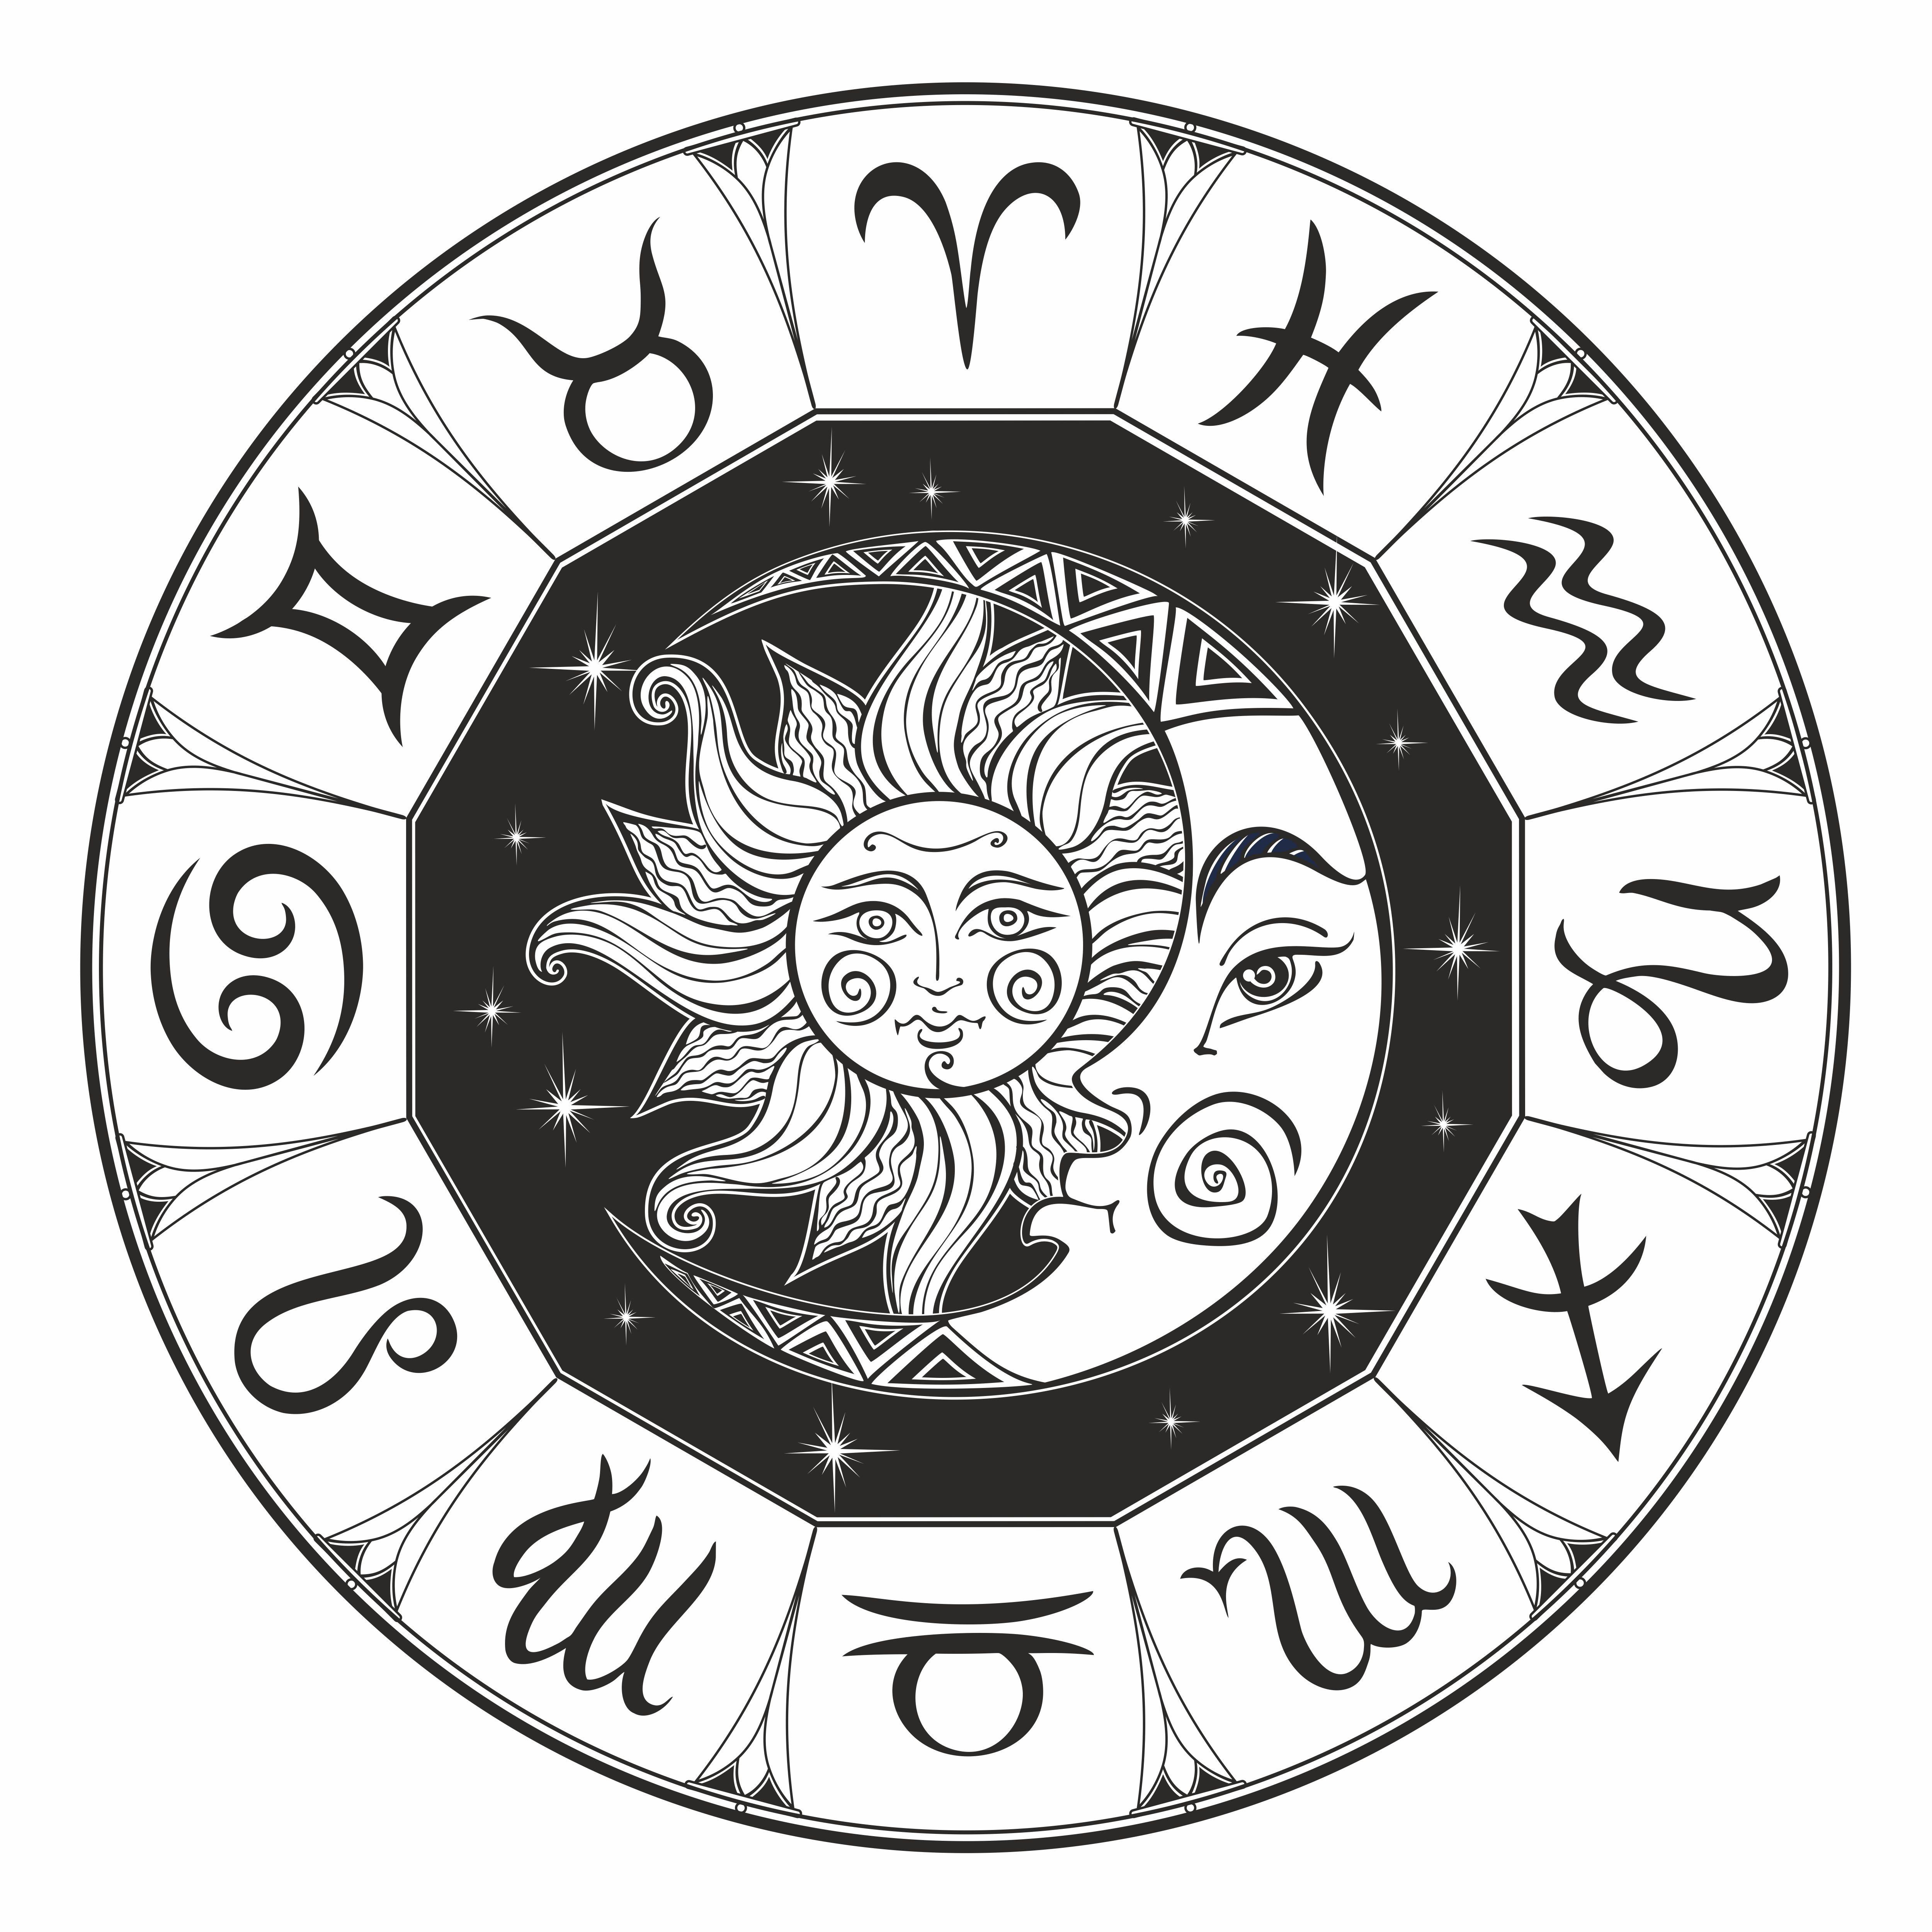 zodiac astrological symbol horoscope the sun and the